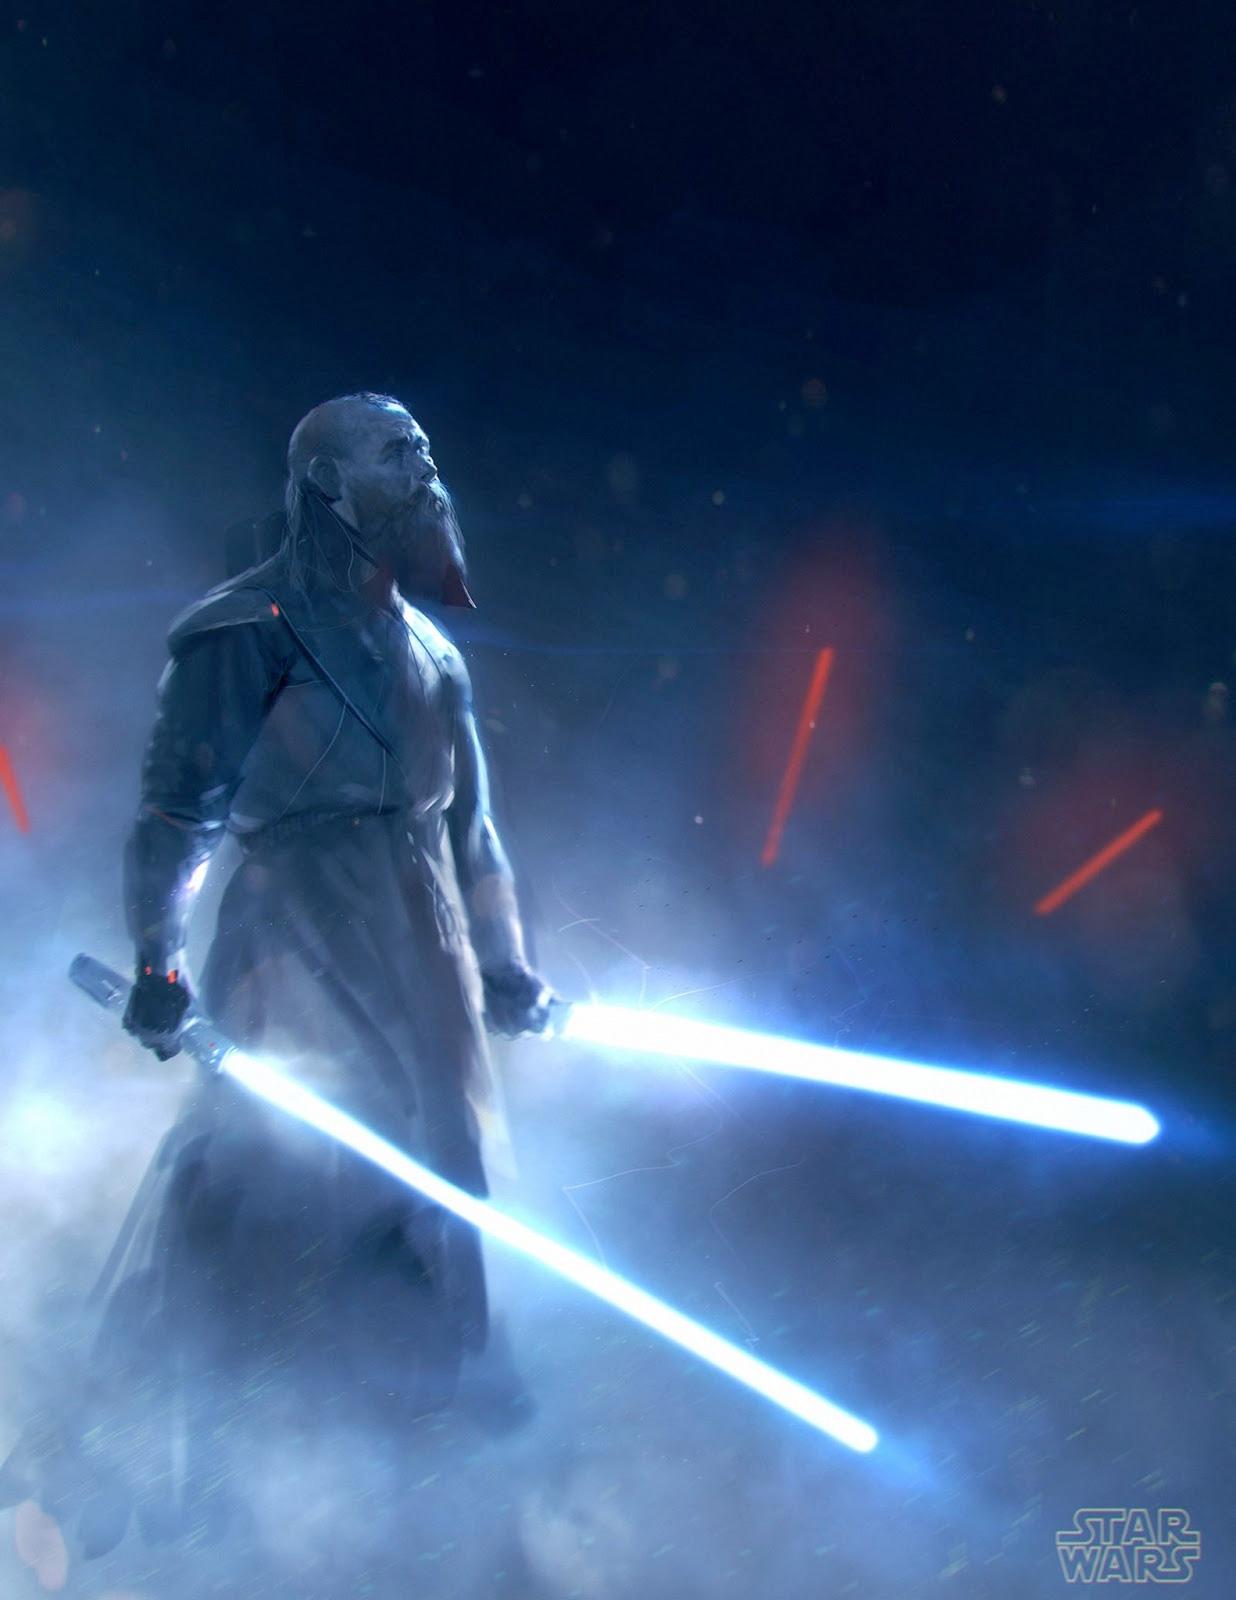 Star Wars Concept Art And Illustrations Concept Art World